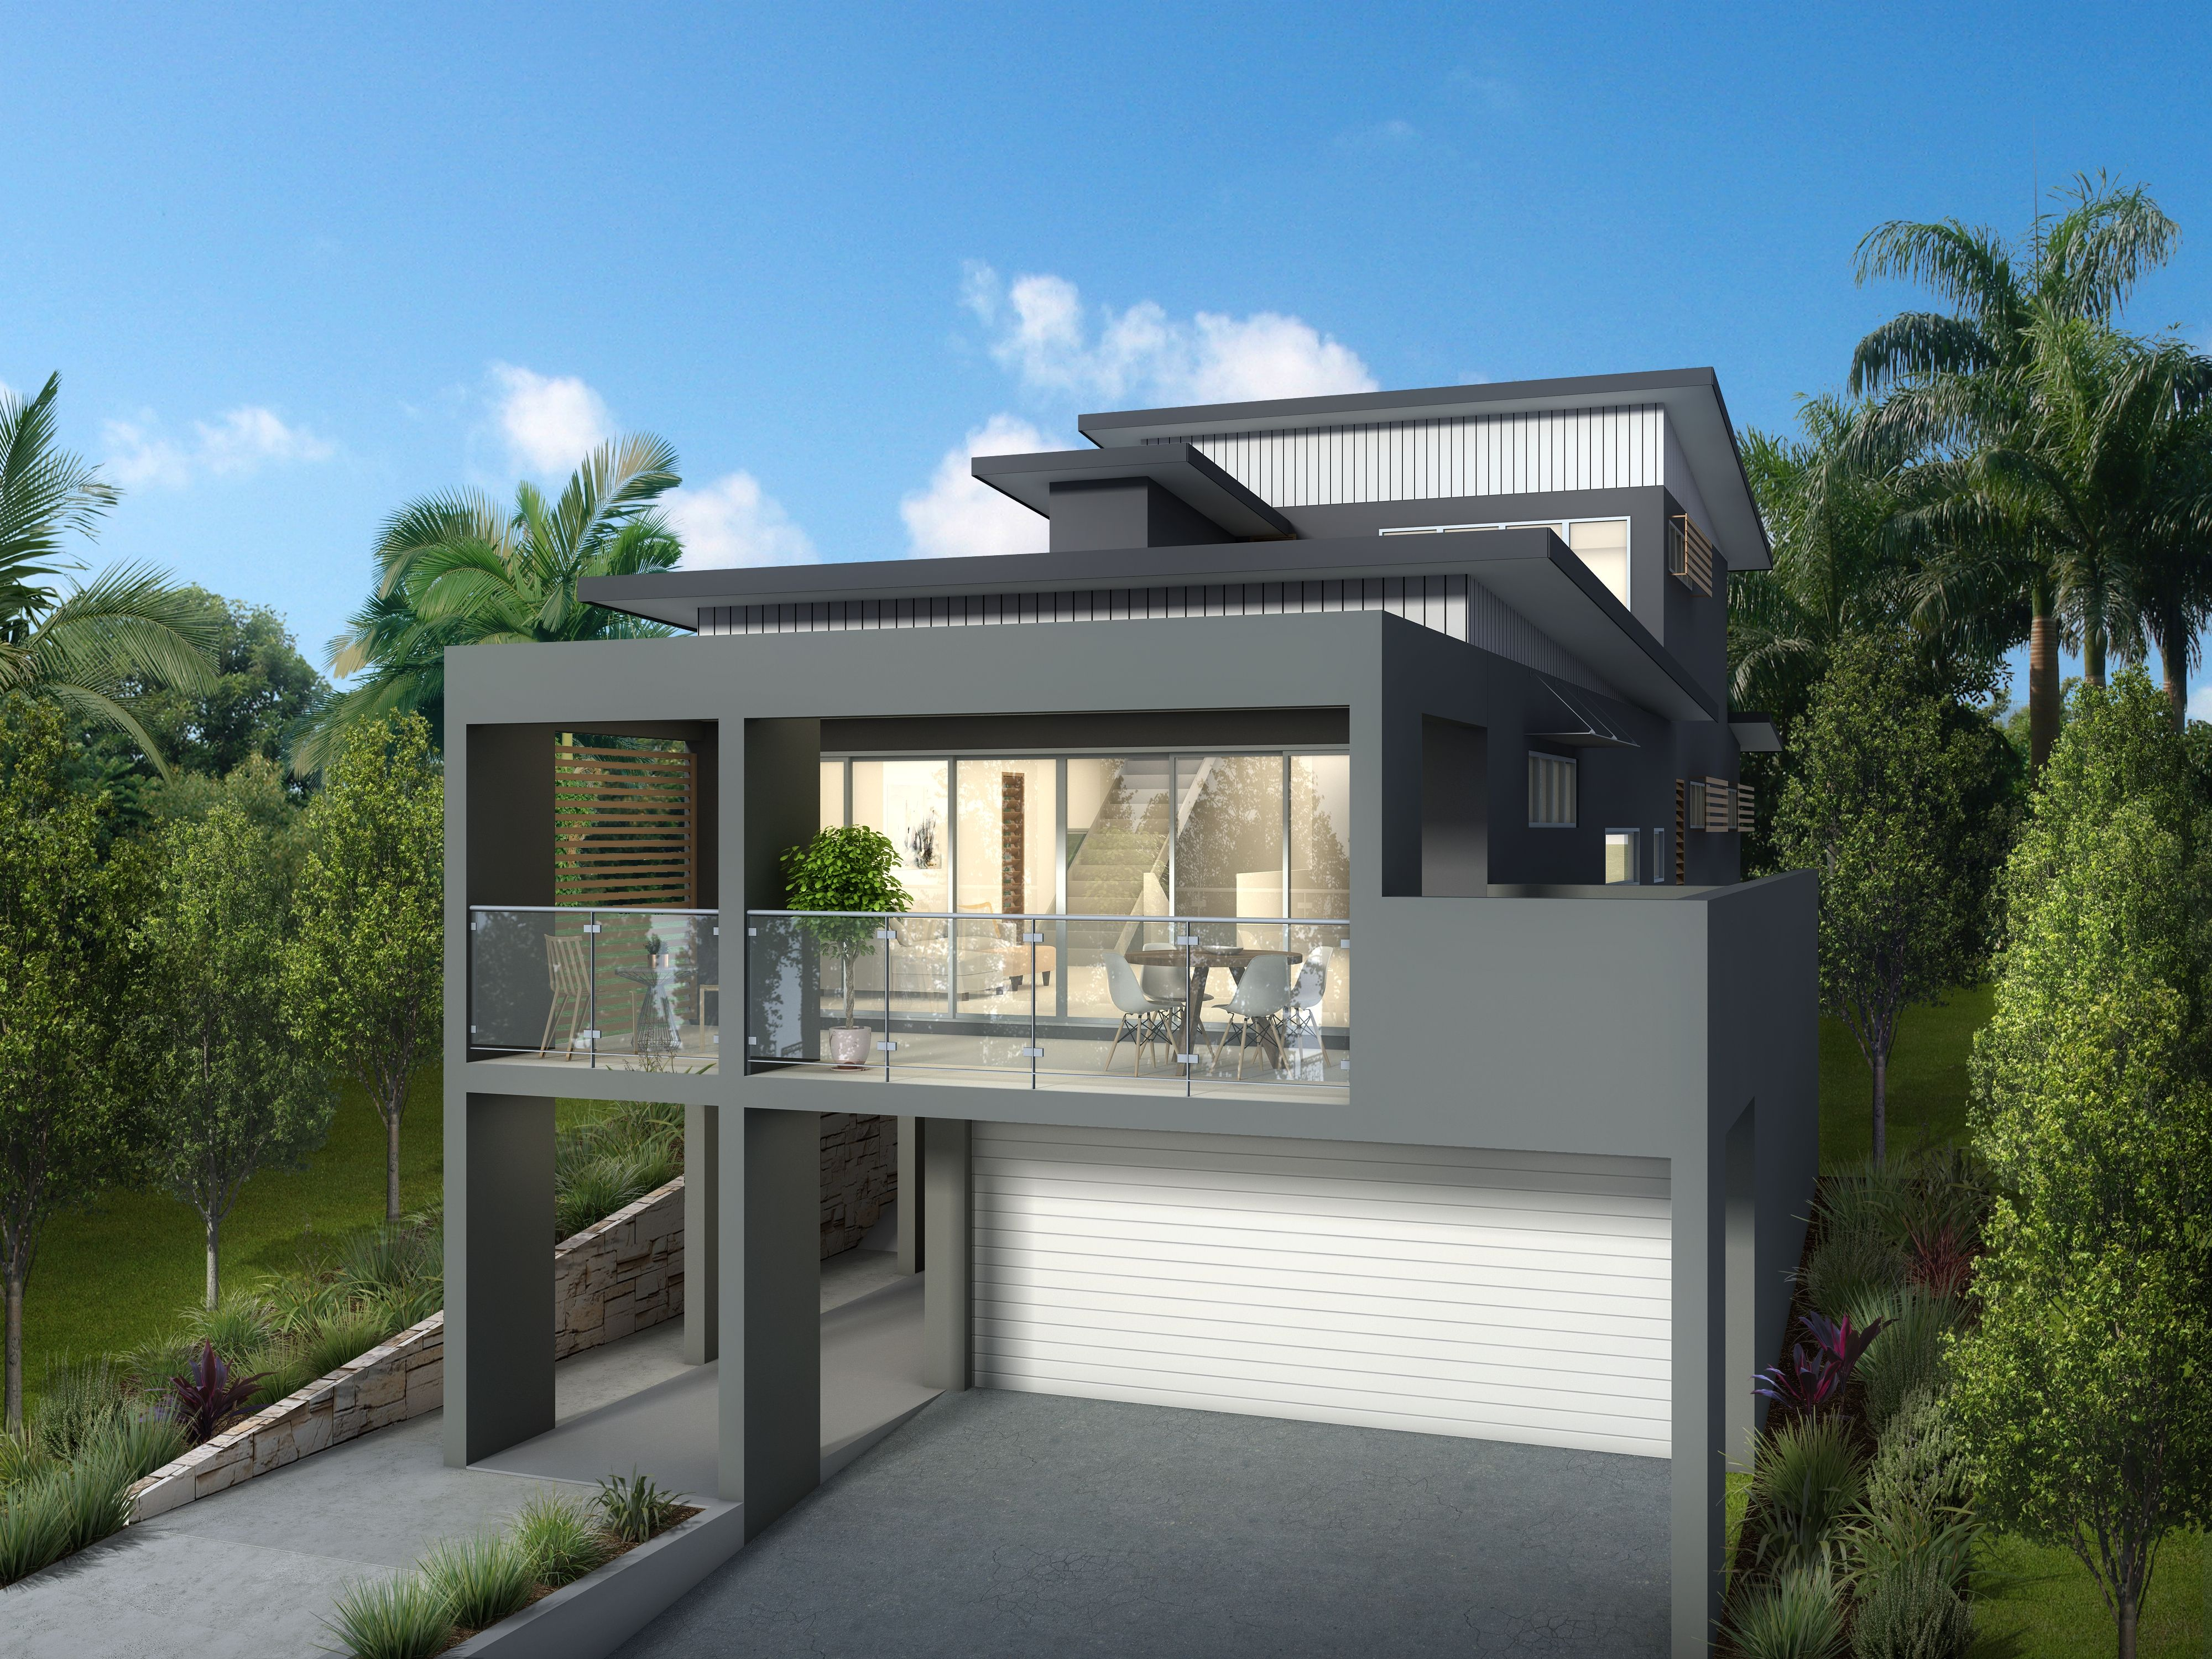 M4004 Craftsman House Plans Sloping Lot House Plan House Design